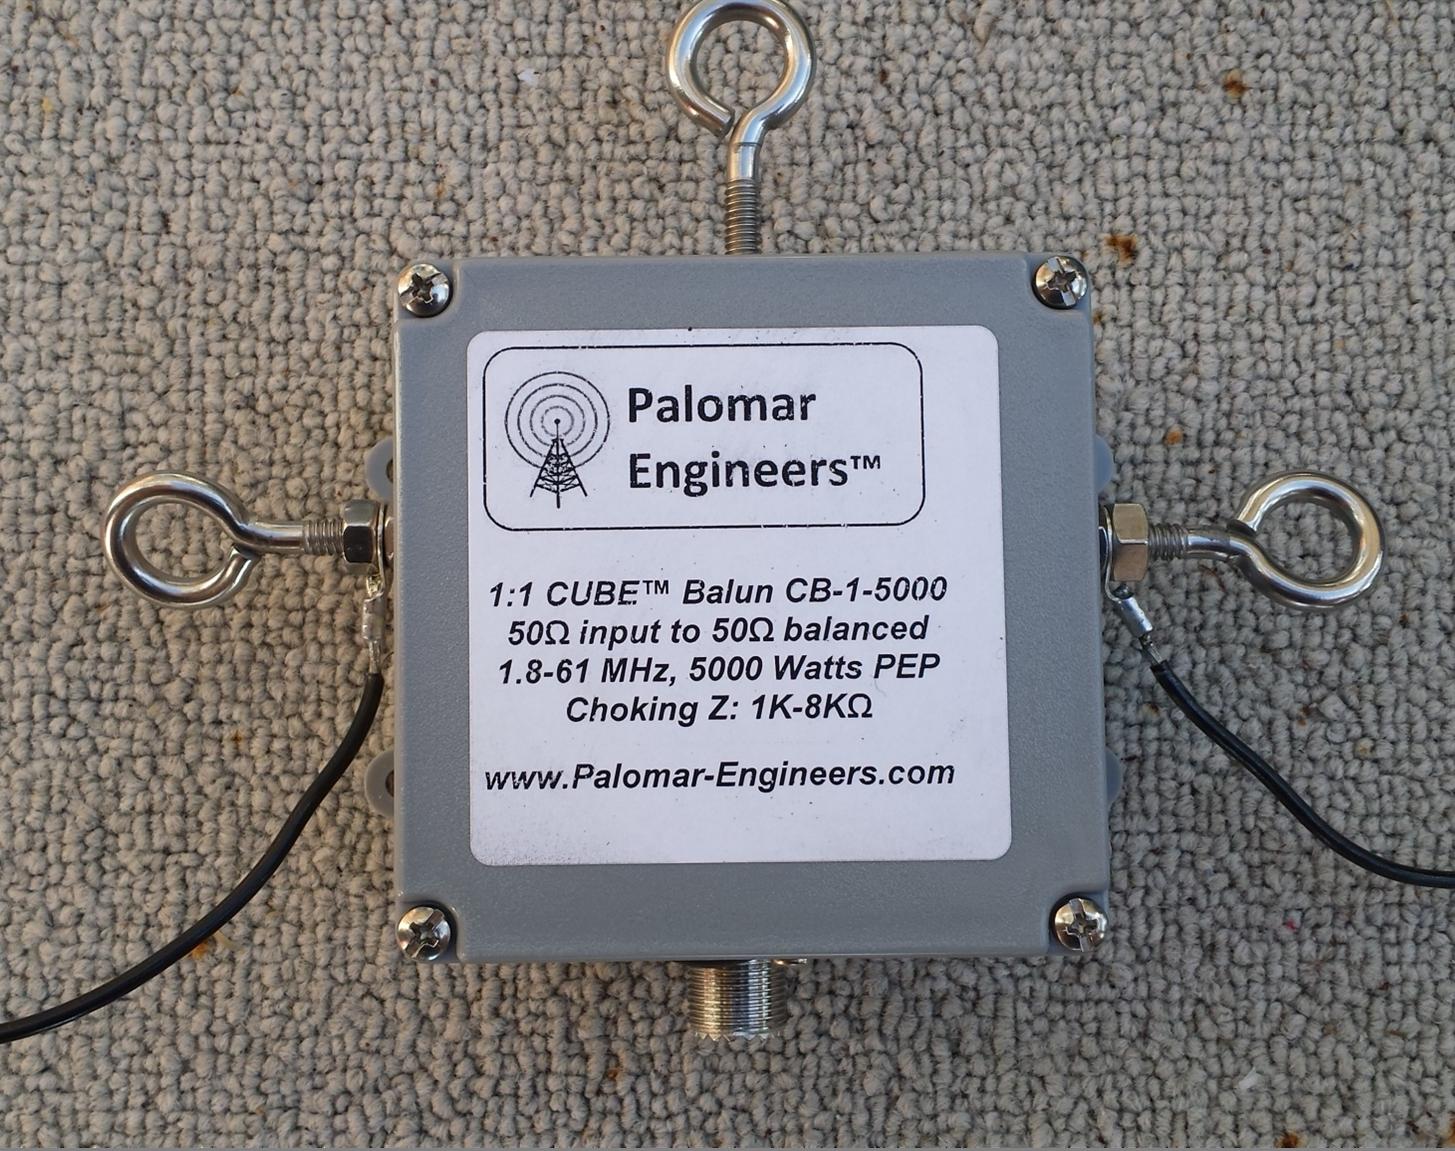 CUBE Feed Line Choke Balun, 5KW, 1.8-61 MHz CB-1-5000